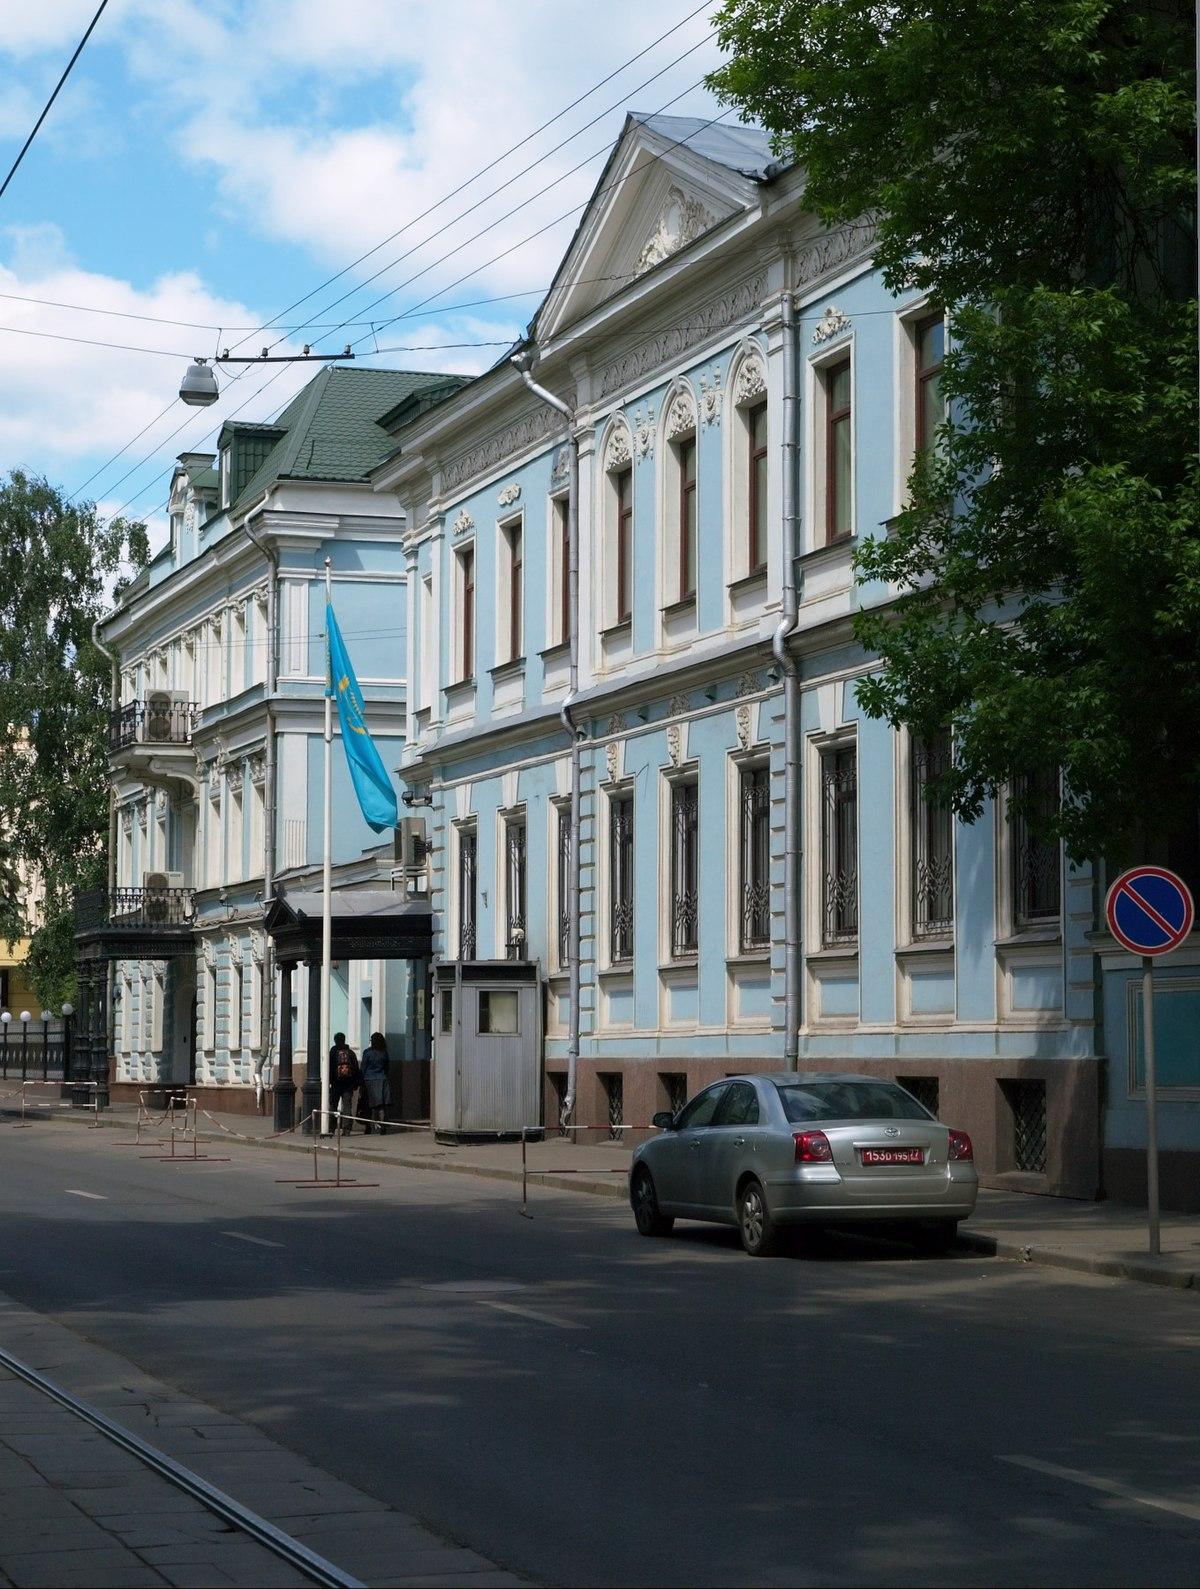 https://upload.wikimedia.org/wikipedia/commons/thumb/1/13/Moscow%2C_Chistoprudny_3A%2C_embassy_of_Kazakhstan.jpg/1200px-Moscow%2C_Chistoprudny_3A%2C_embassy_of_Kazakhstan.jpg